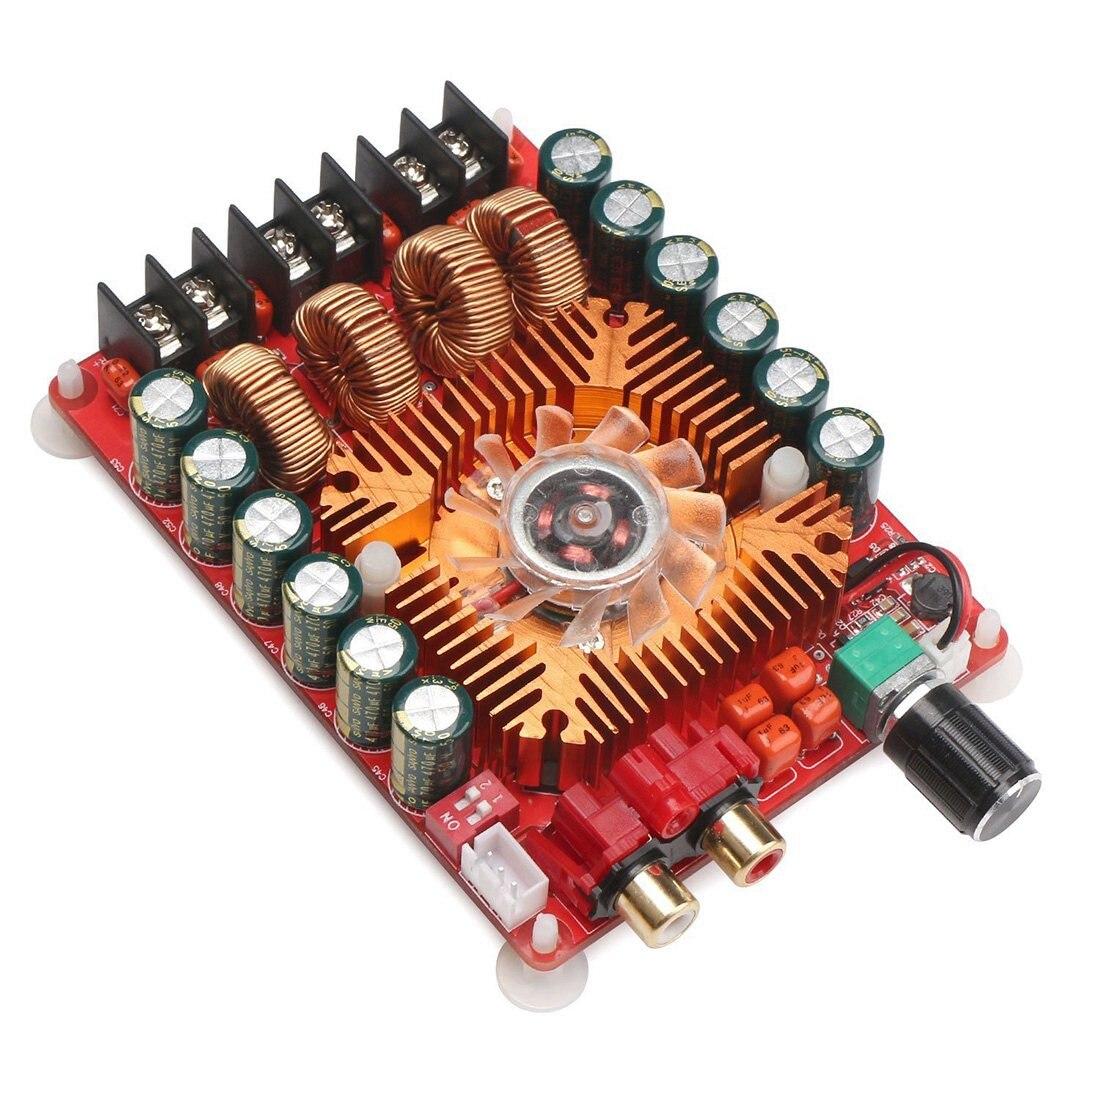 Tda7498e 2x160w Dual Channel Audio Amplifier Boardsupport Btl Mode Hifi Ipod Circuit Using Ic 741 Electronic 2x160 24